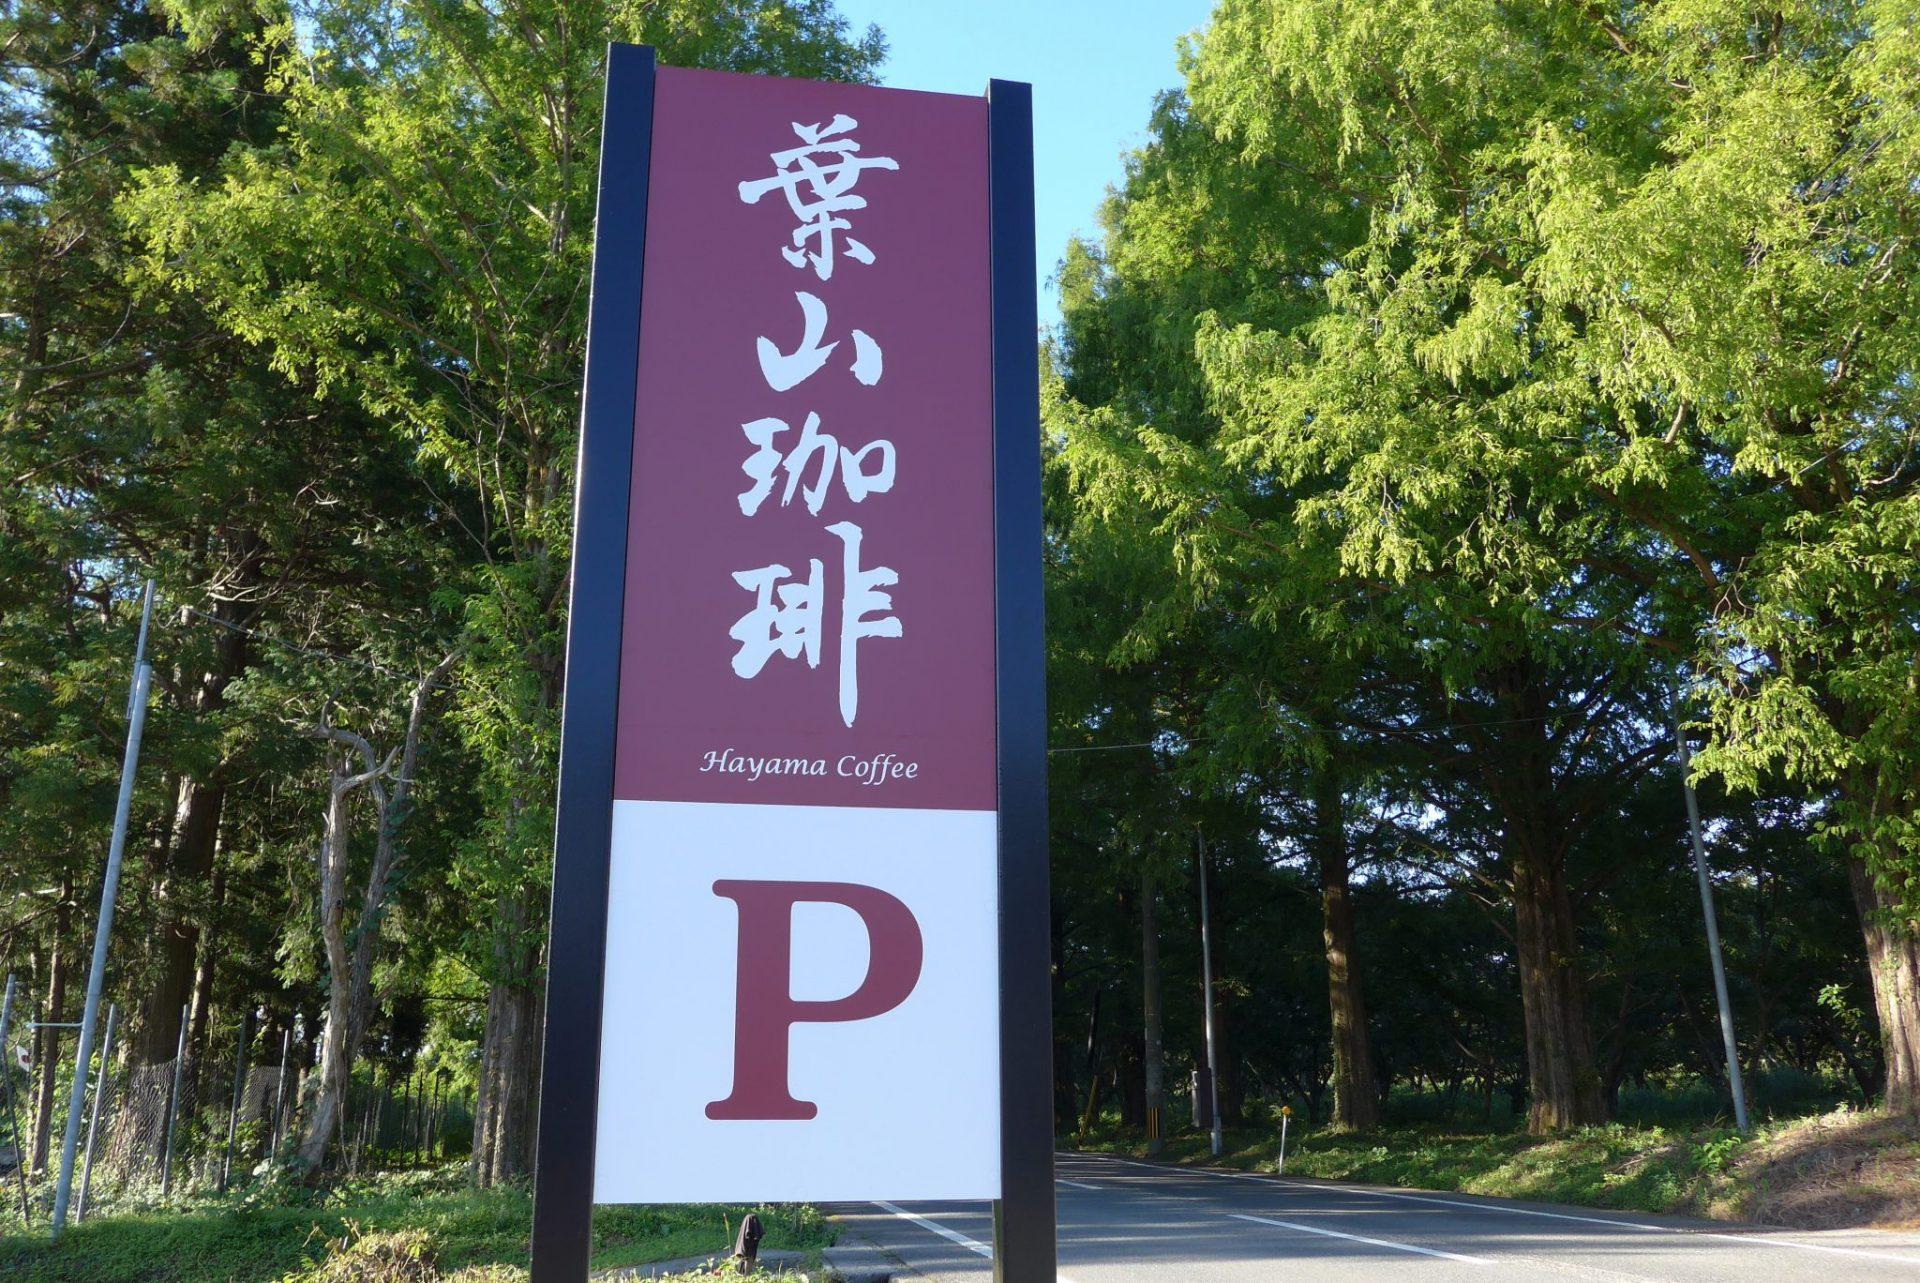 (K)マキノ高原メタセコイヤ並木は駐車場完備で安心!カフェも!